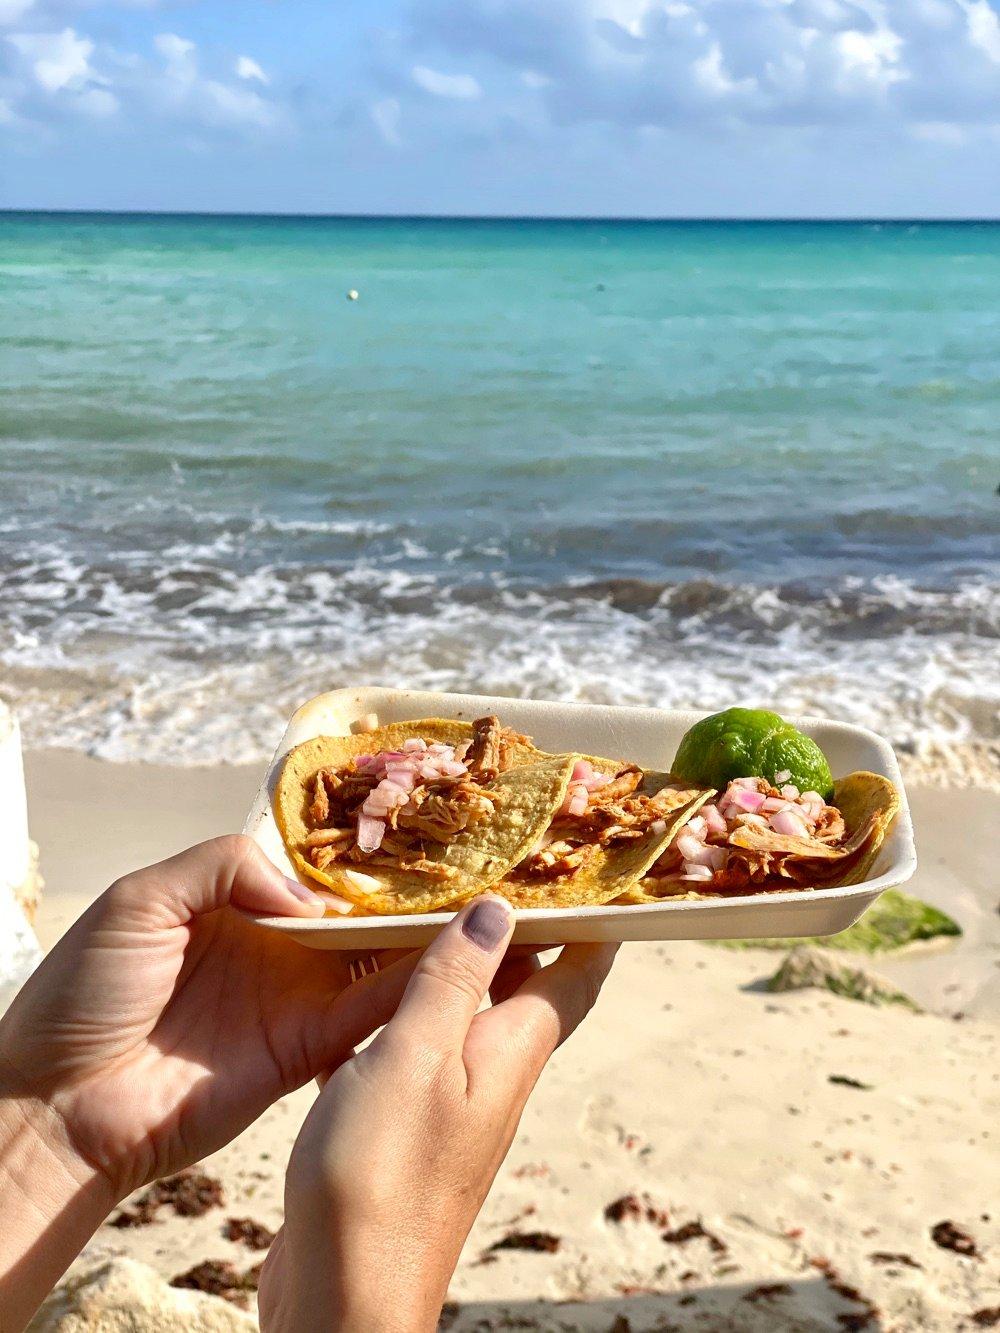 eating tacos in playa del carmen mexico